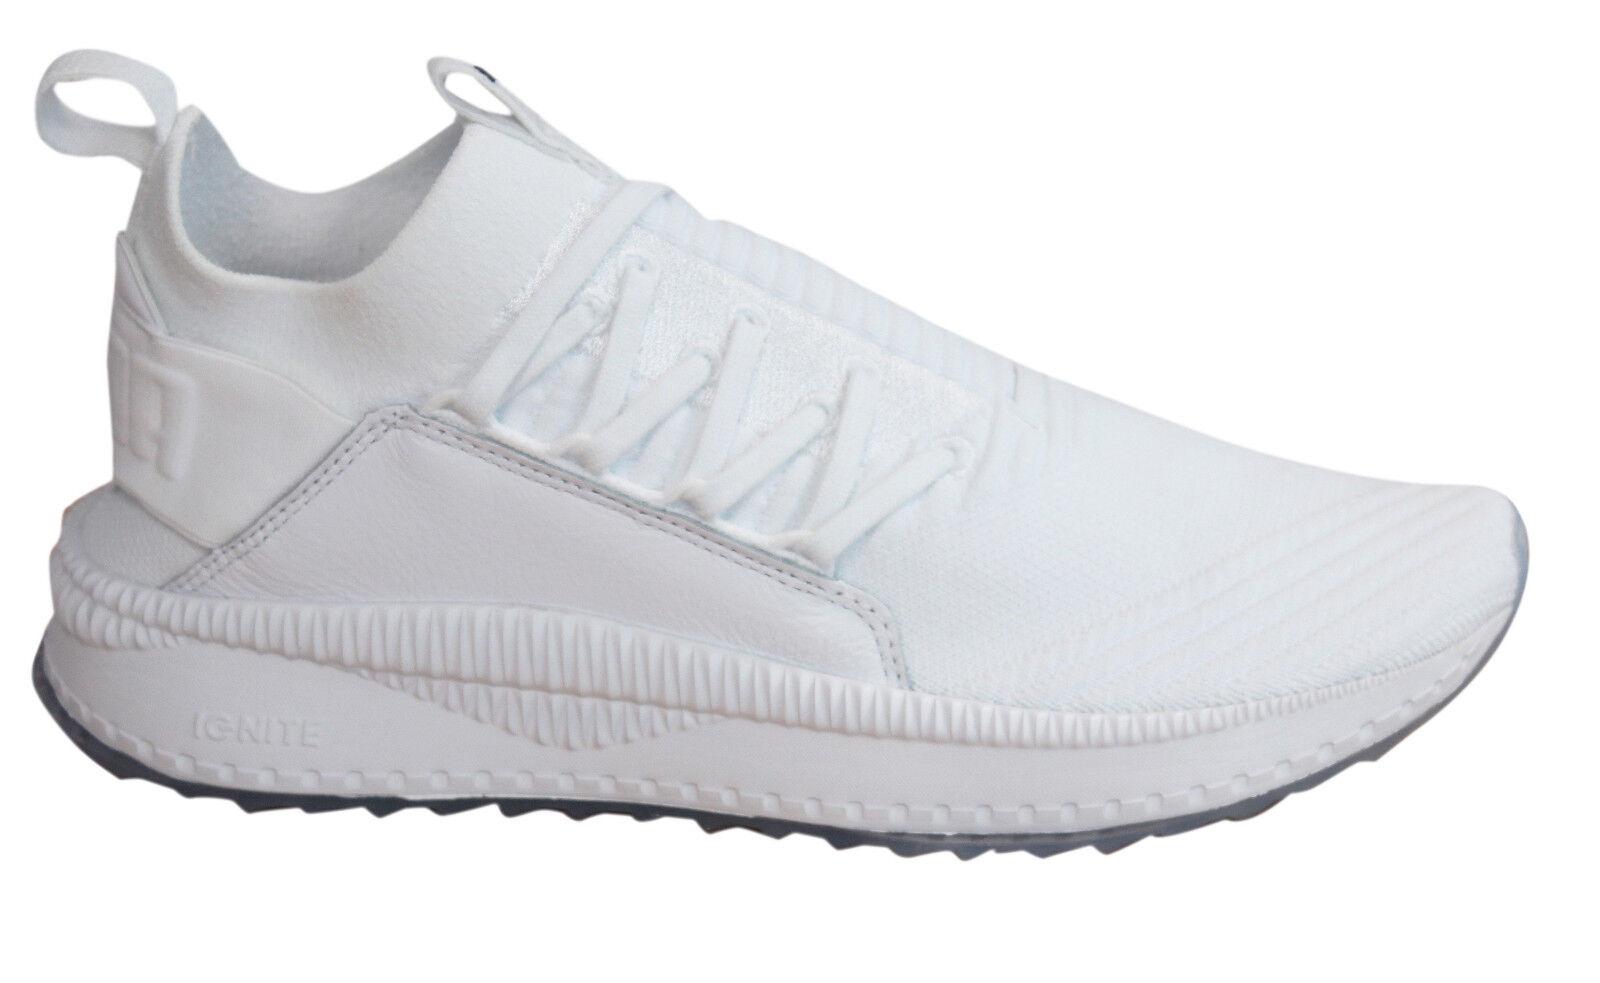 Puma TSUGI Jun Lace Up White Textile Sock Fit Mens Trainers Shoes 365489 02 U55